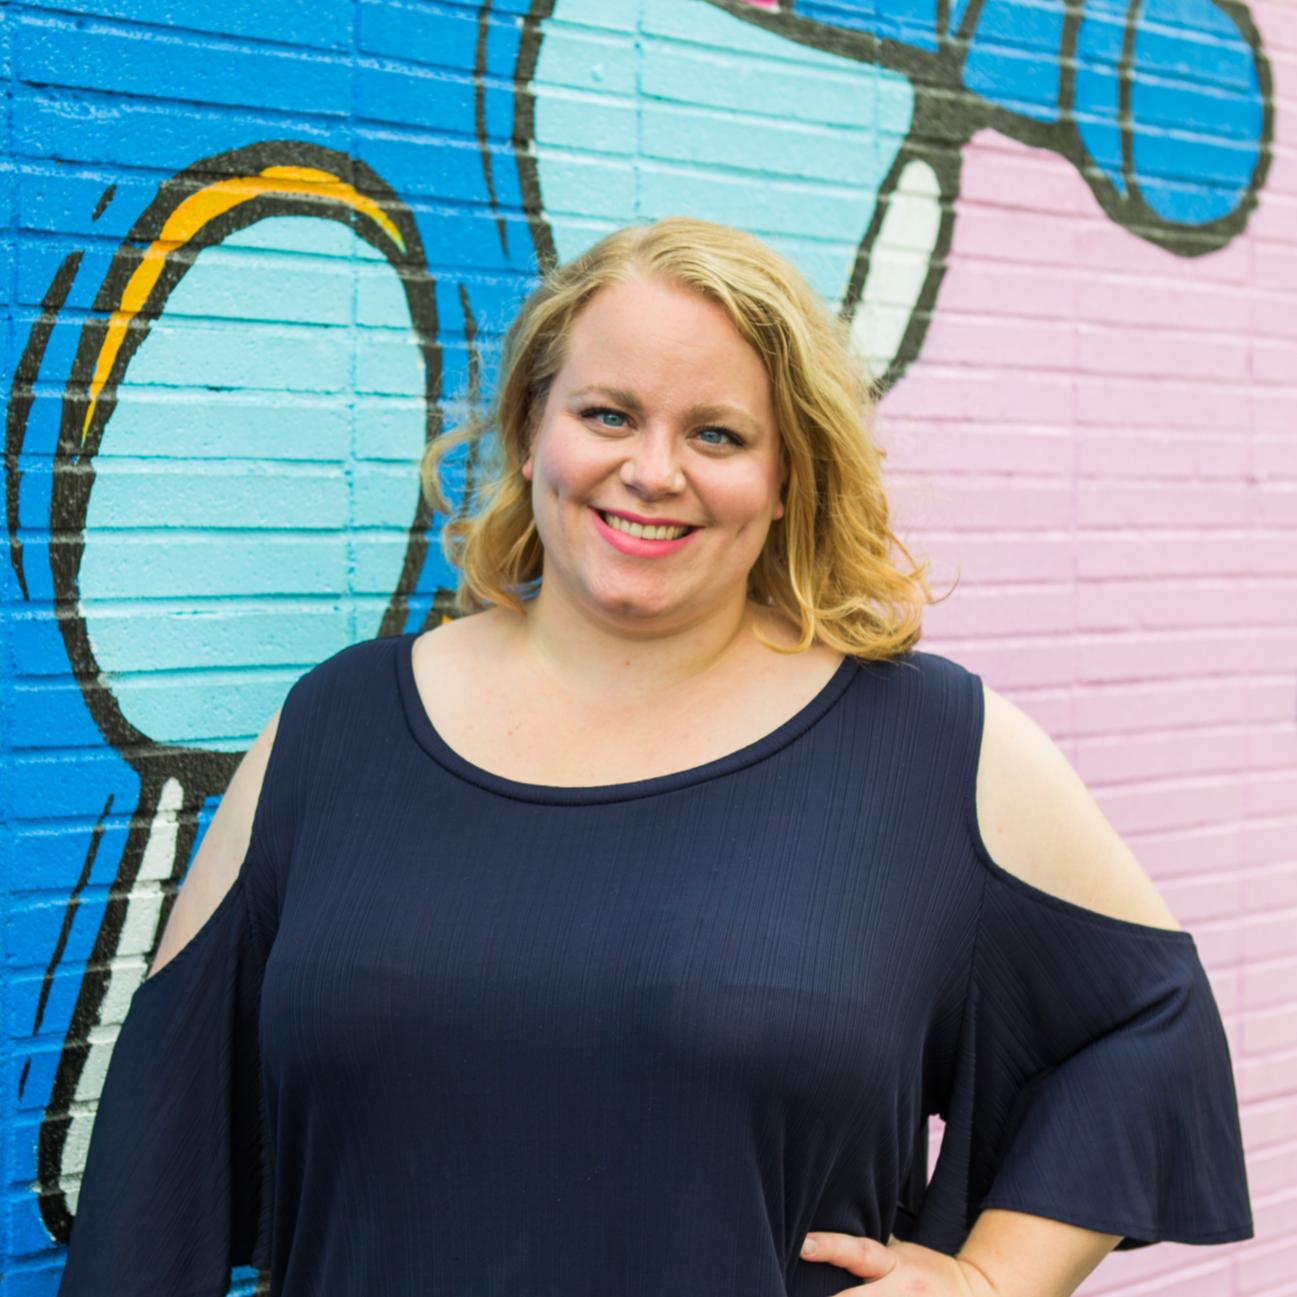 Erin Dilworth Piano Voice Teacher